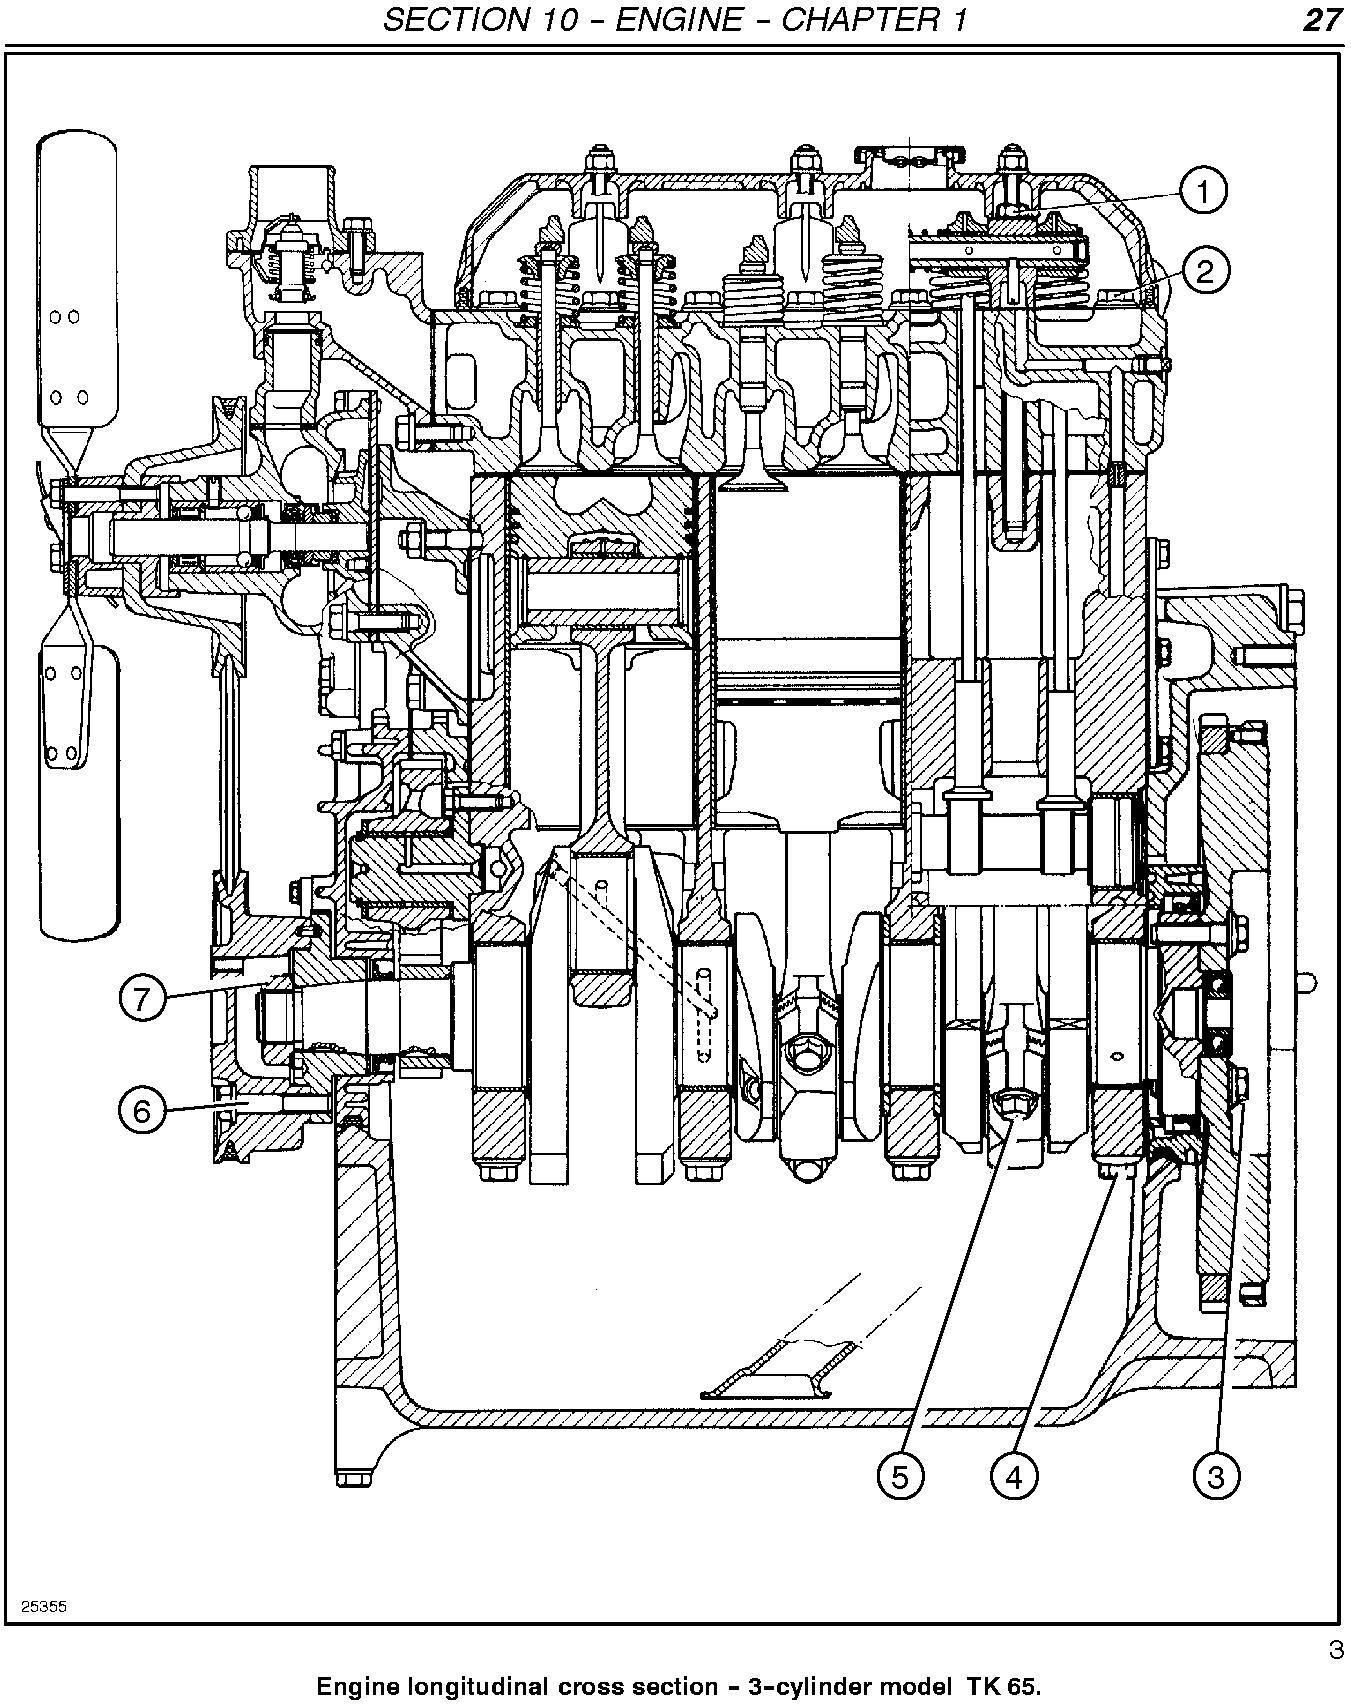 New Holland TK76, TK85, TK85M Crawler Tractor Complete Service Manual - 1